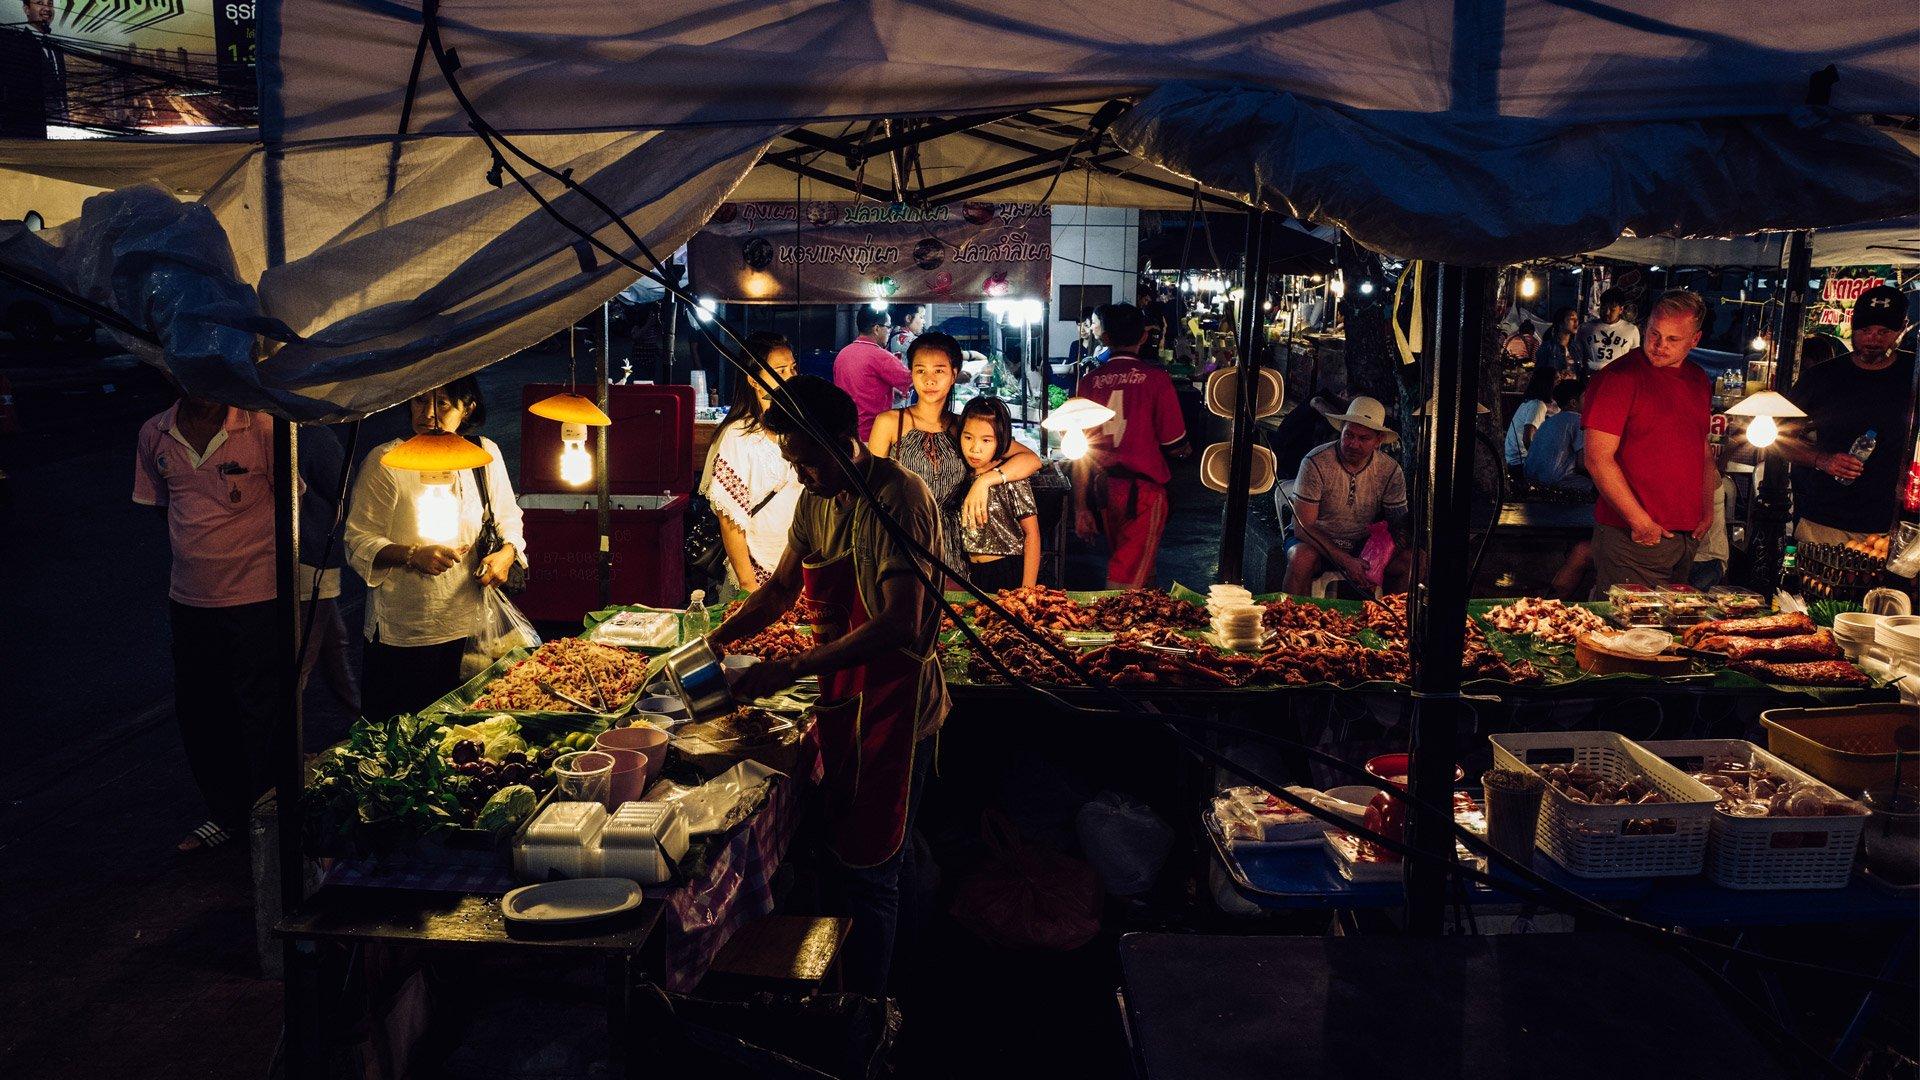 gap-year-travels-street-food